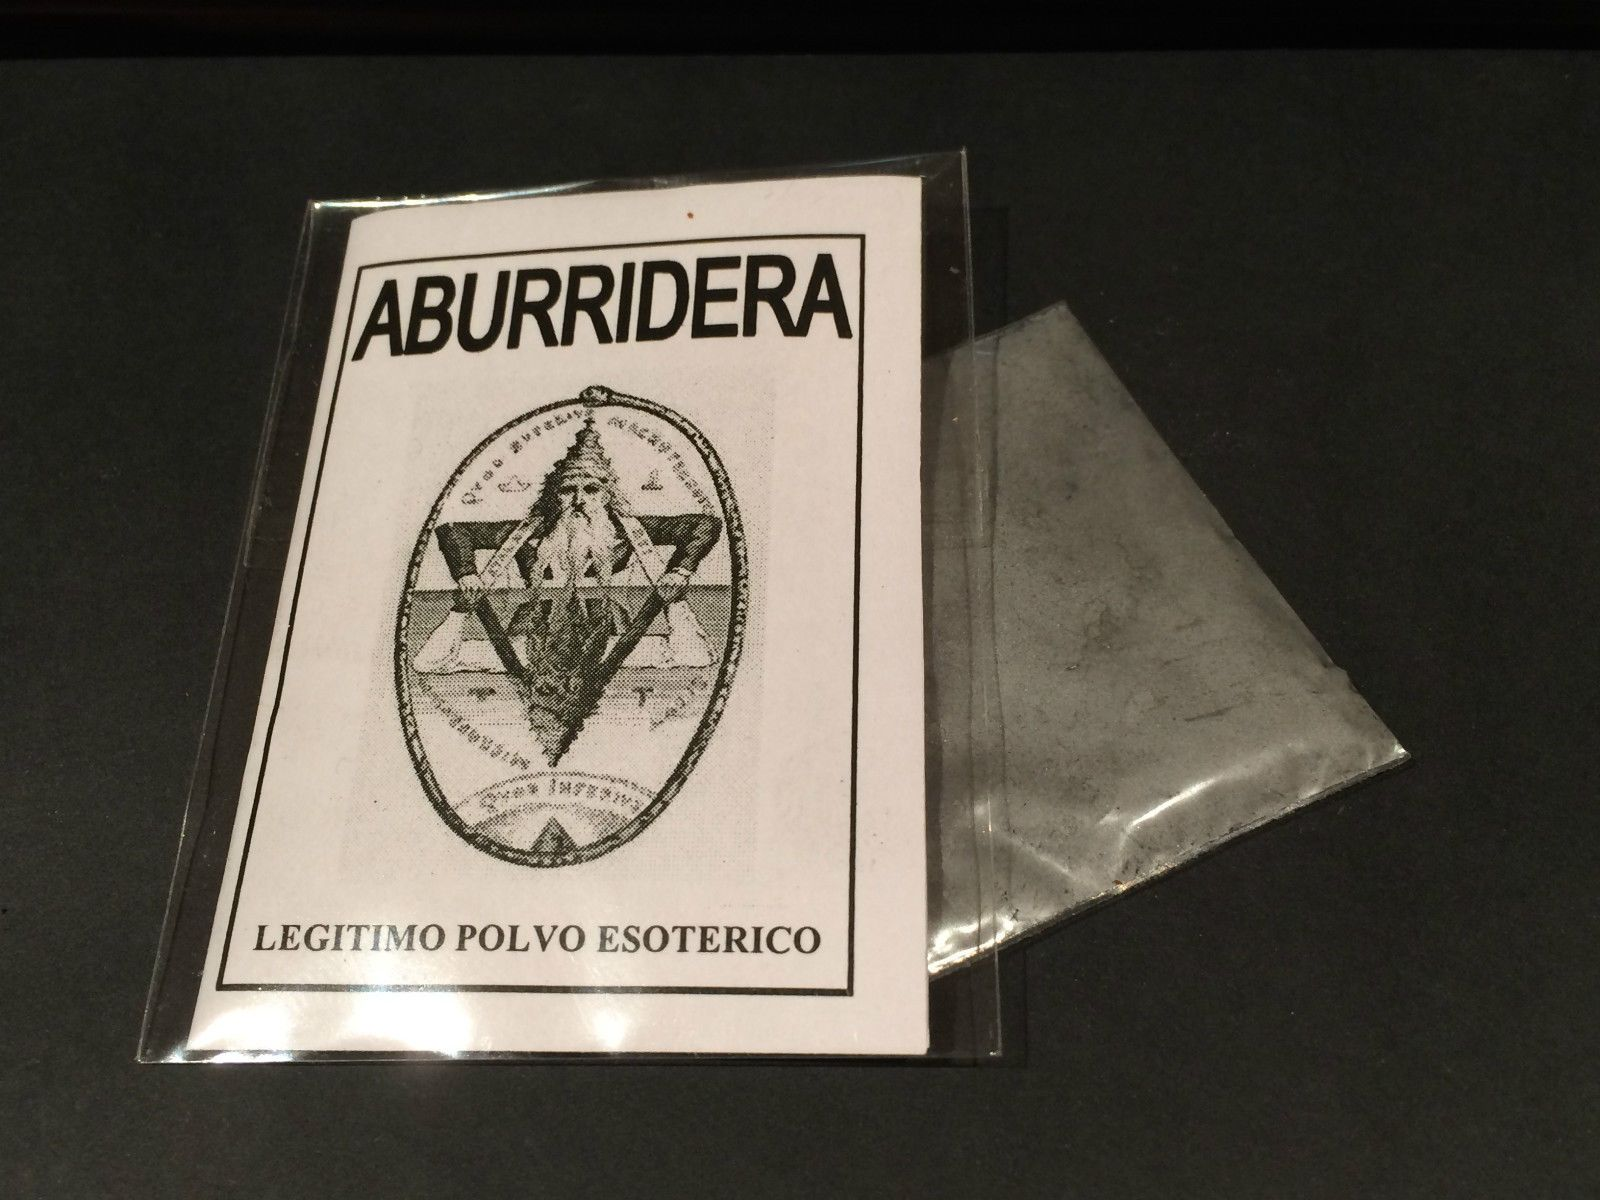 "LEGITIMO POLVO ESOTERICO ESPECIAL "" ABURRIDERA """